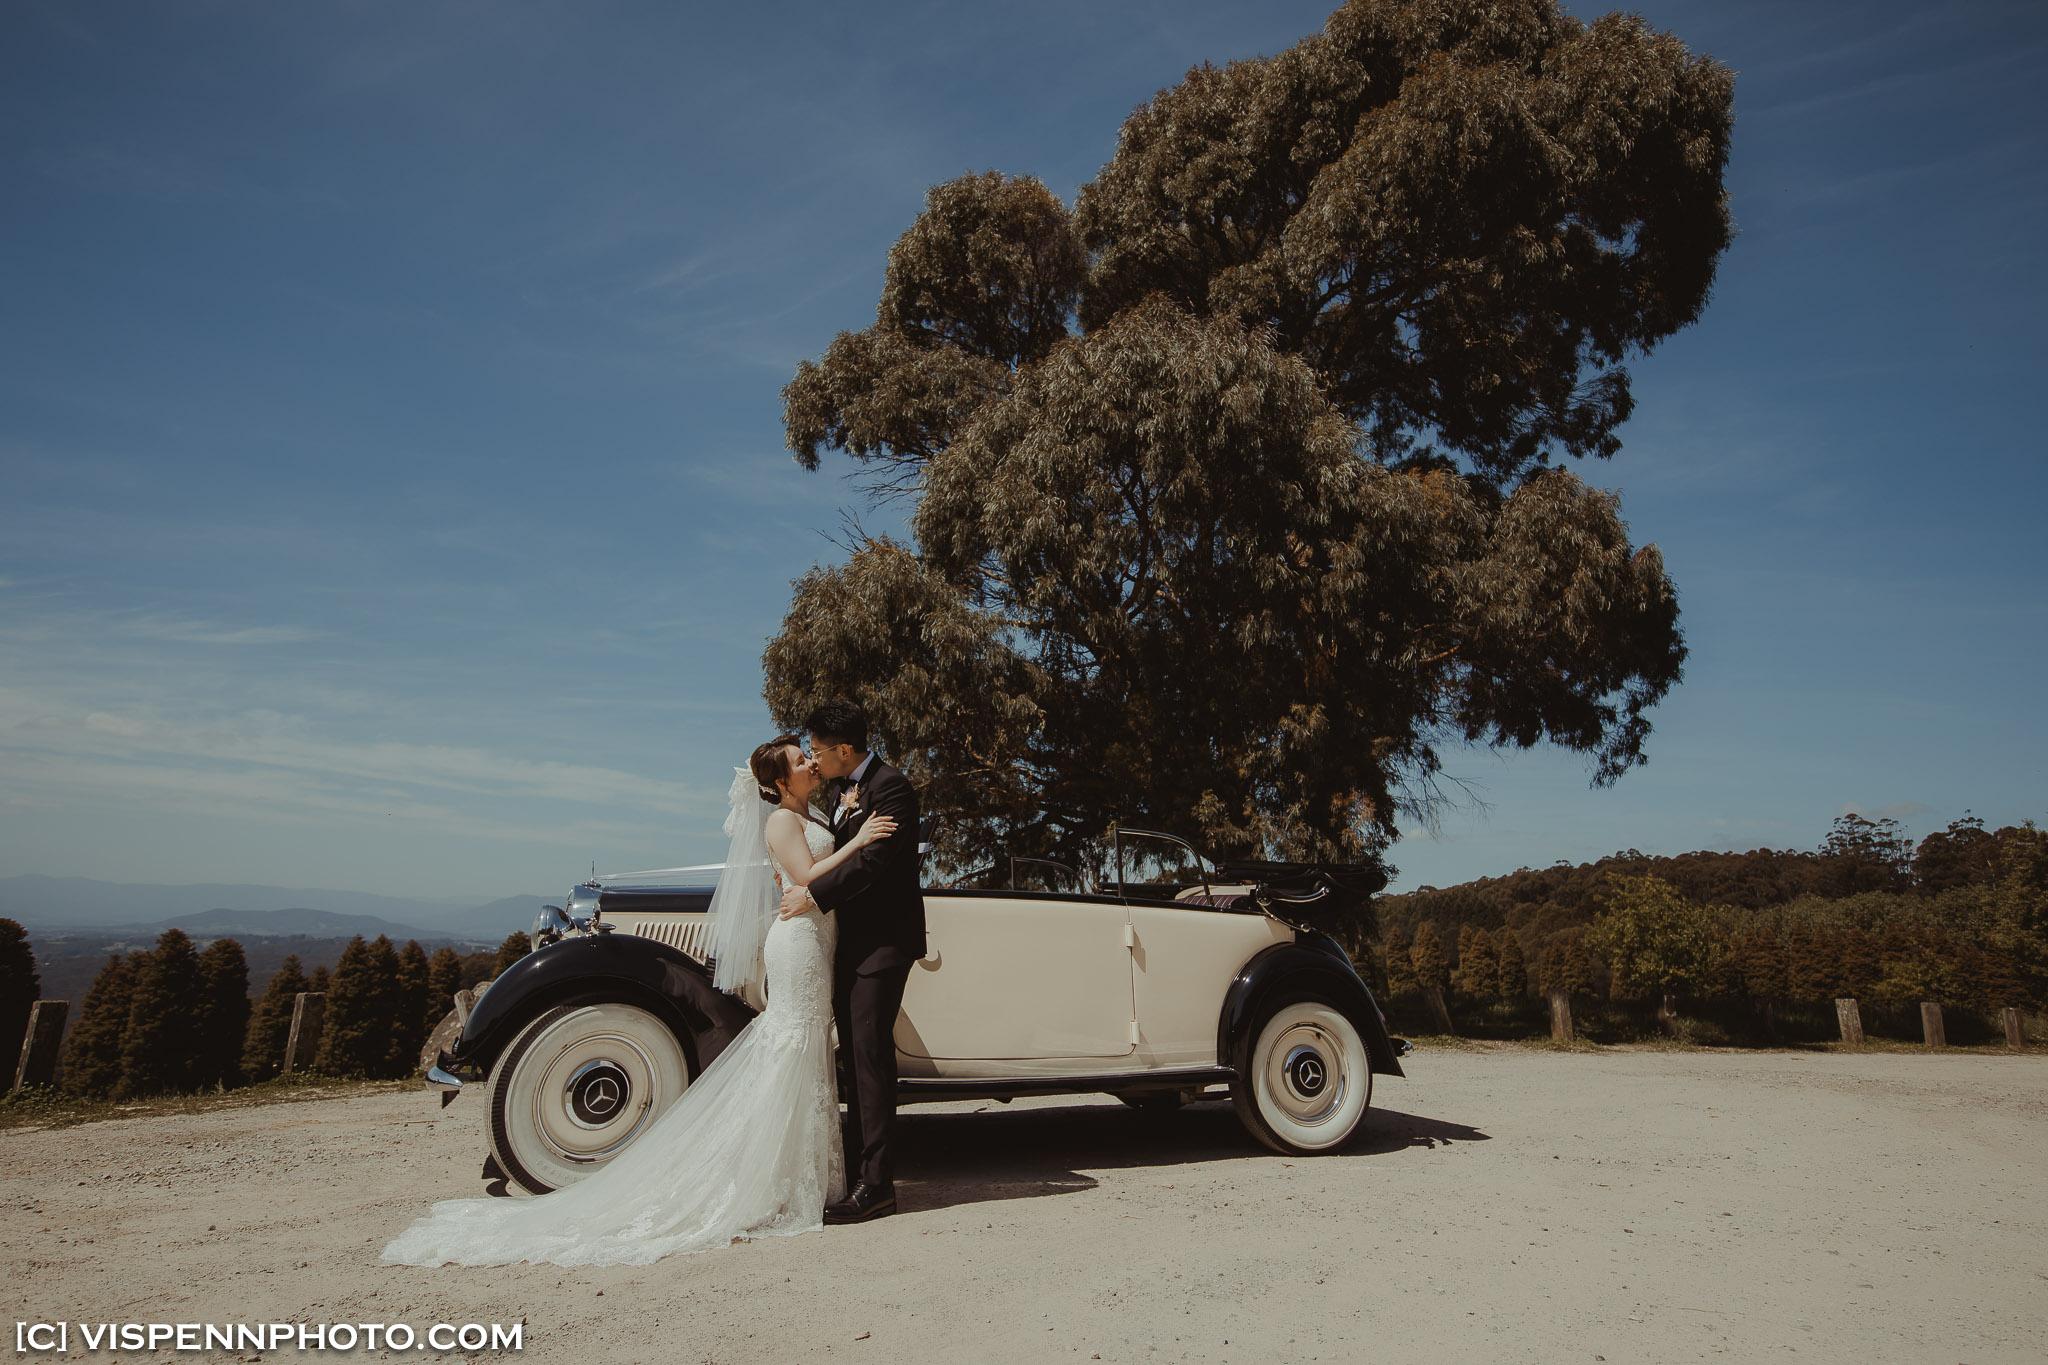 WEDDING DAY Photography Melbourne ElitaPB 05865 3P 5D4 ZHPENN